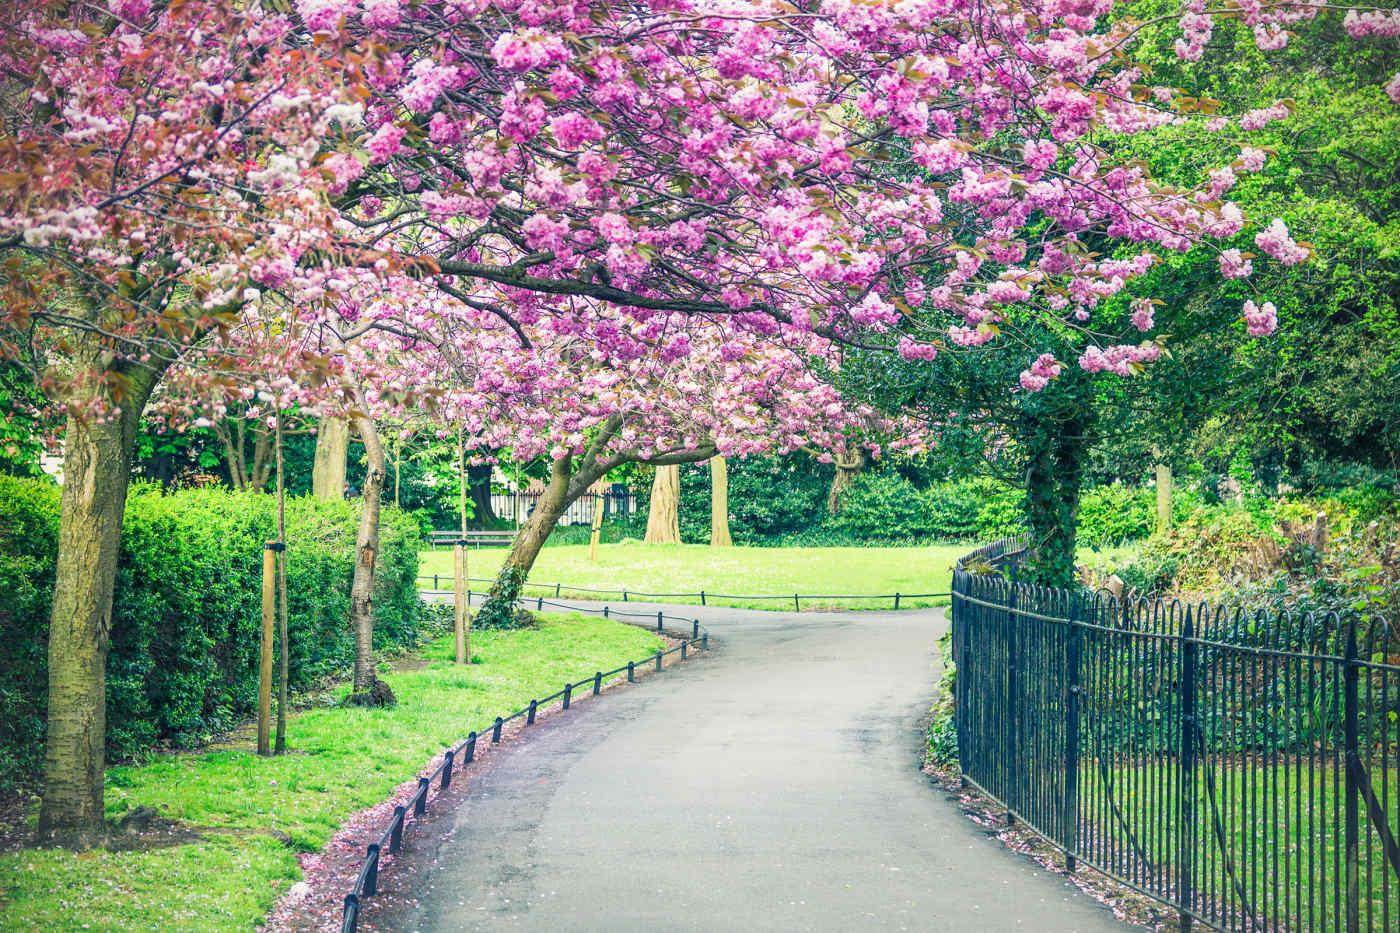 St Stephen's Green • Dublin, Ireland